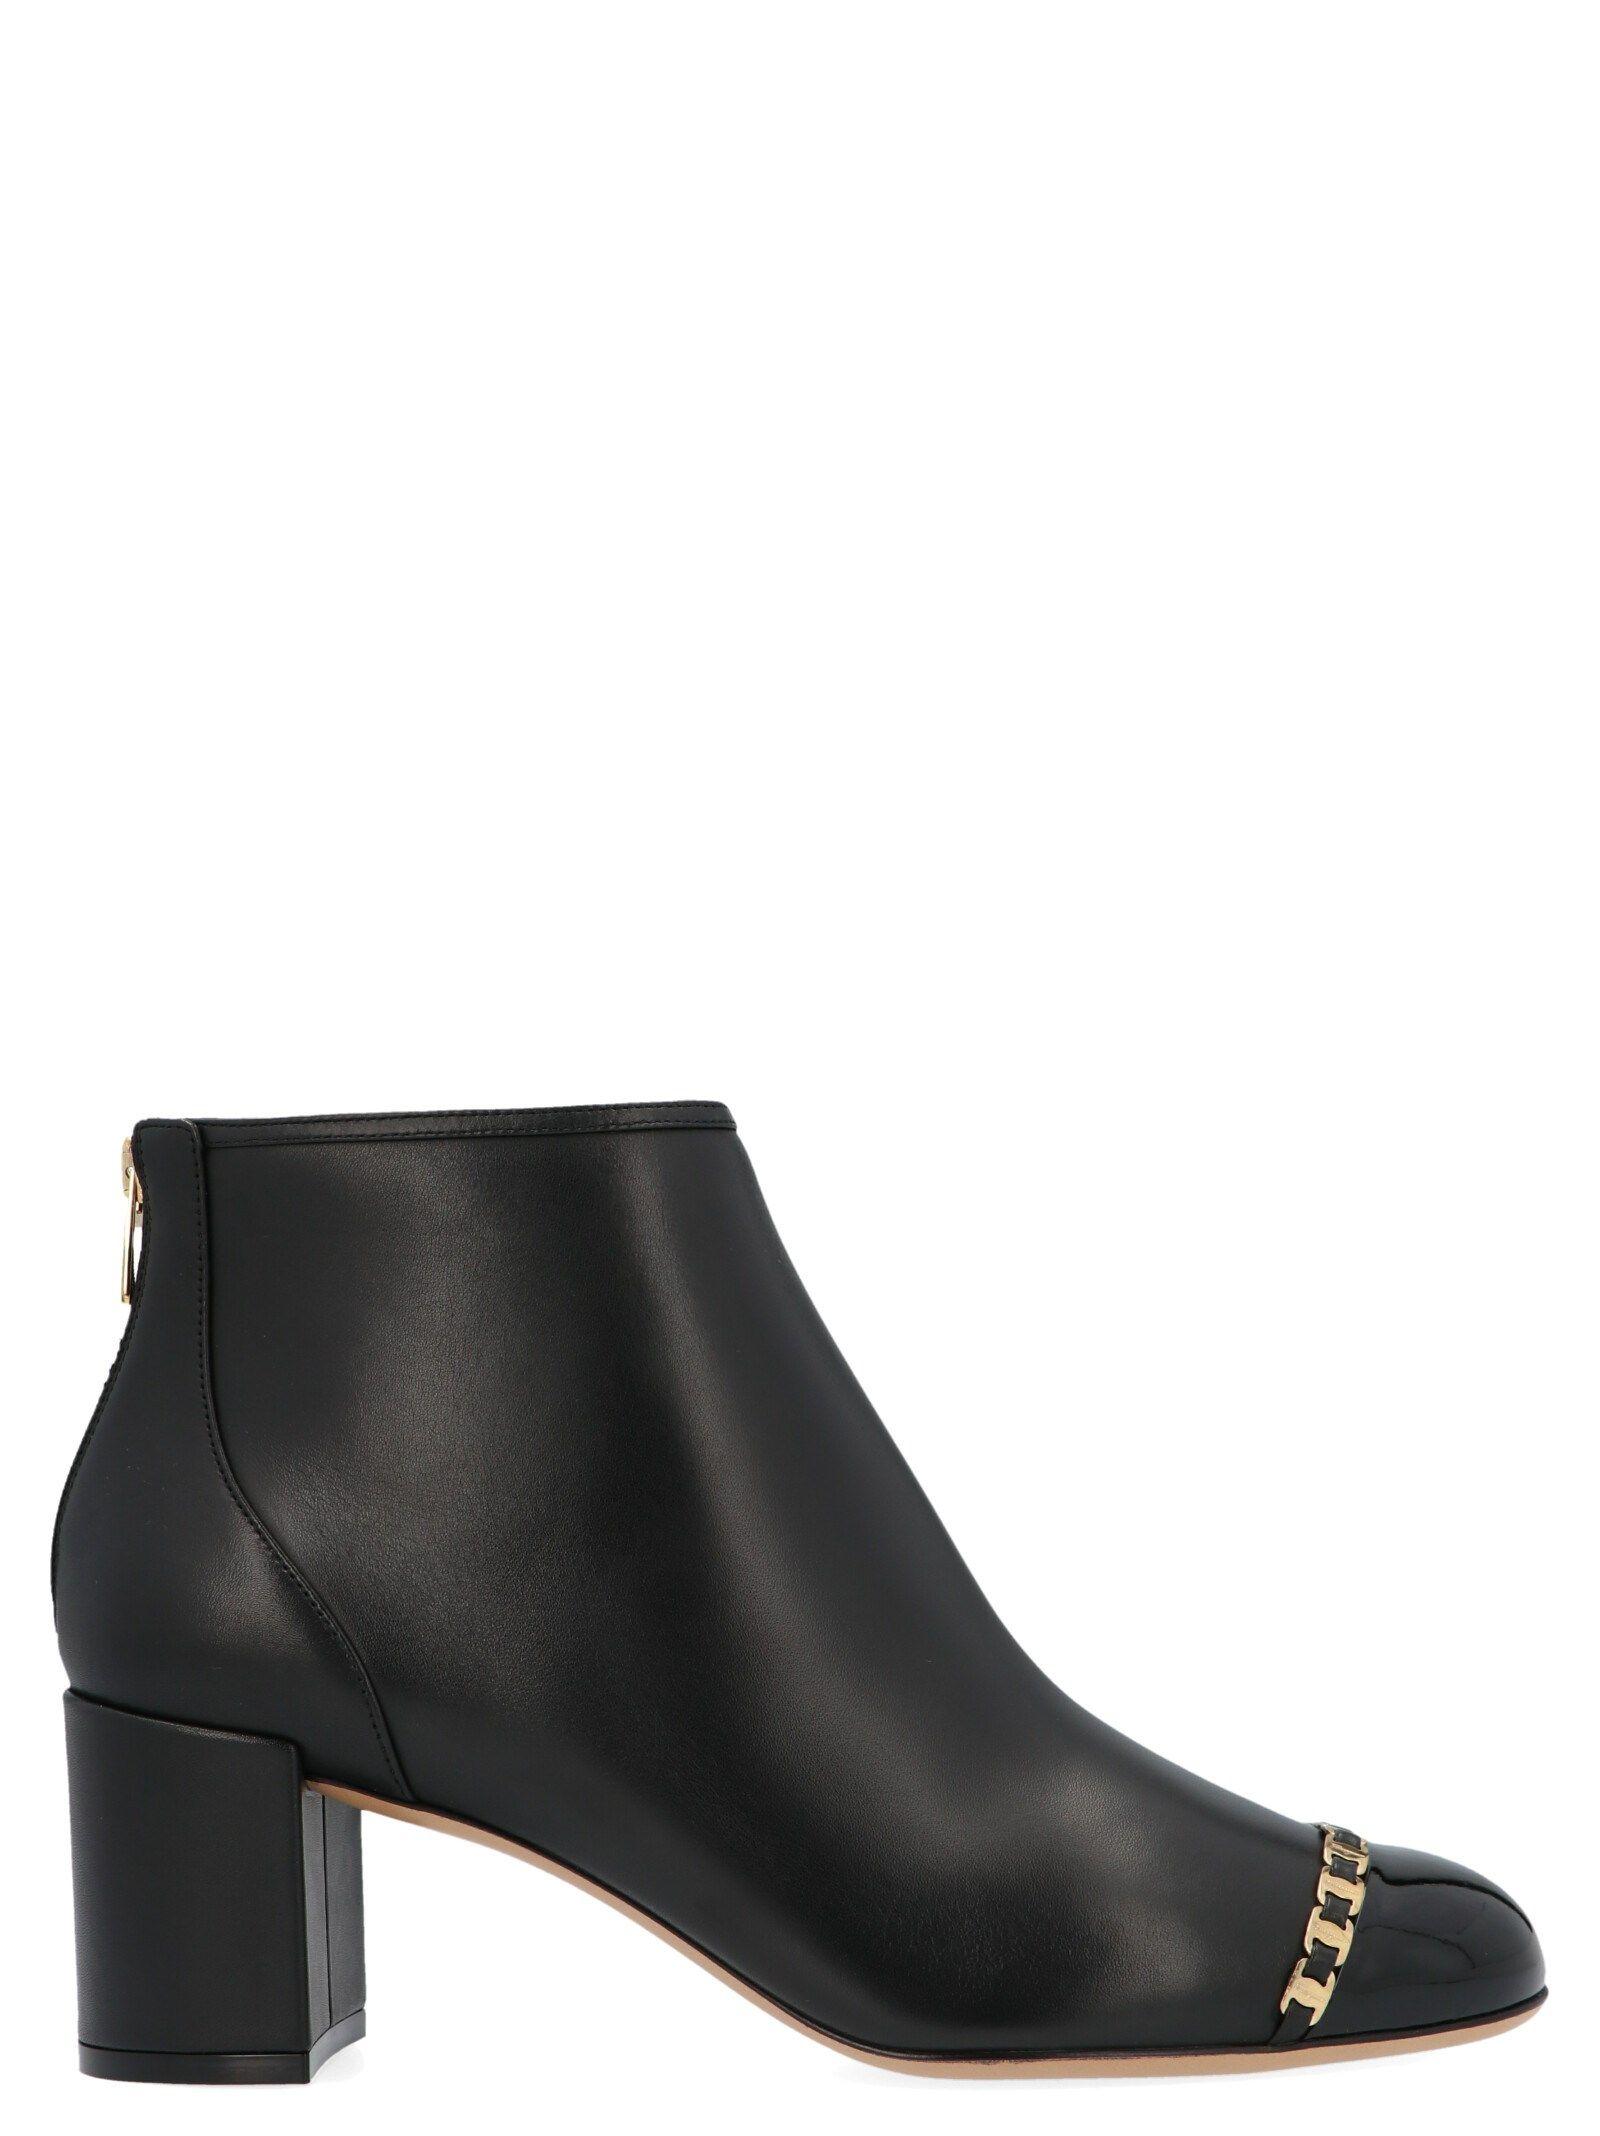 Salvatore Ferragamo Women's Black Leather Ankle Boots